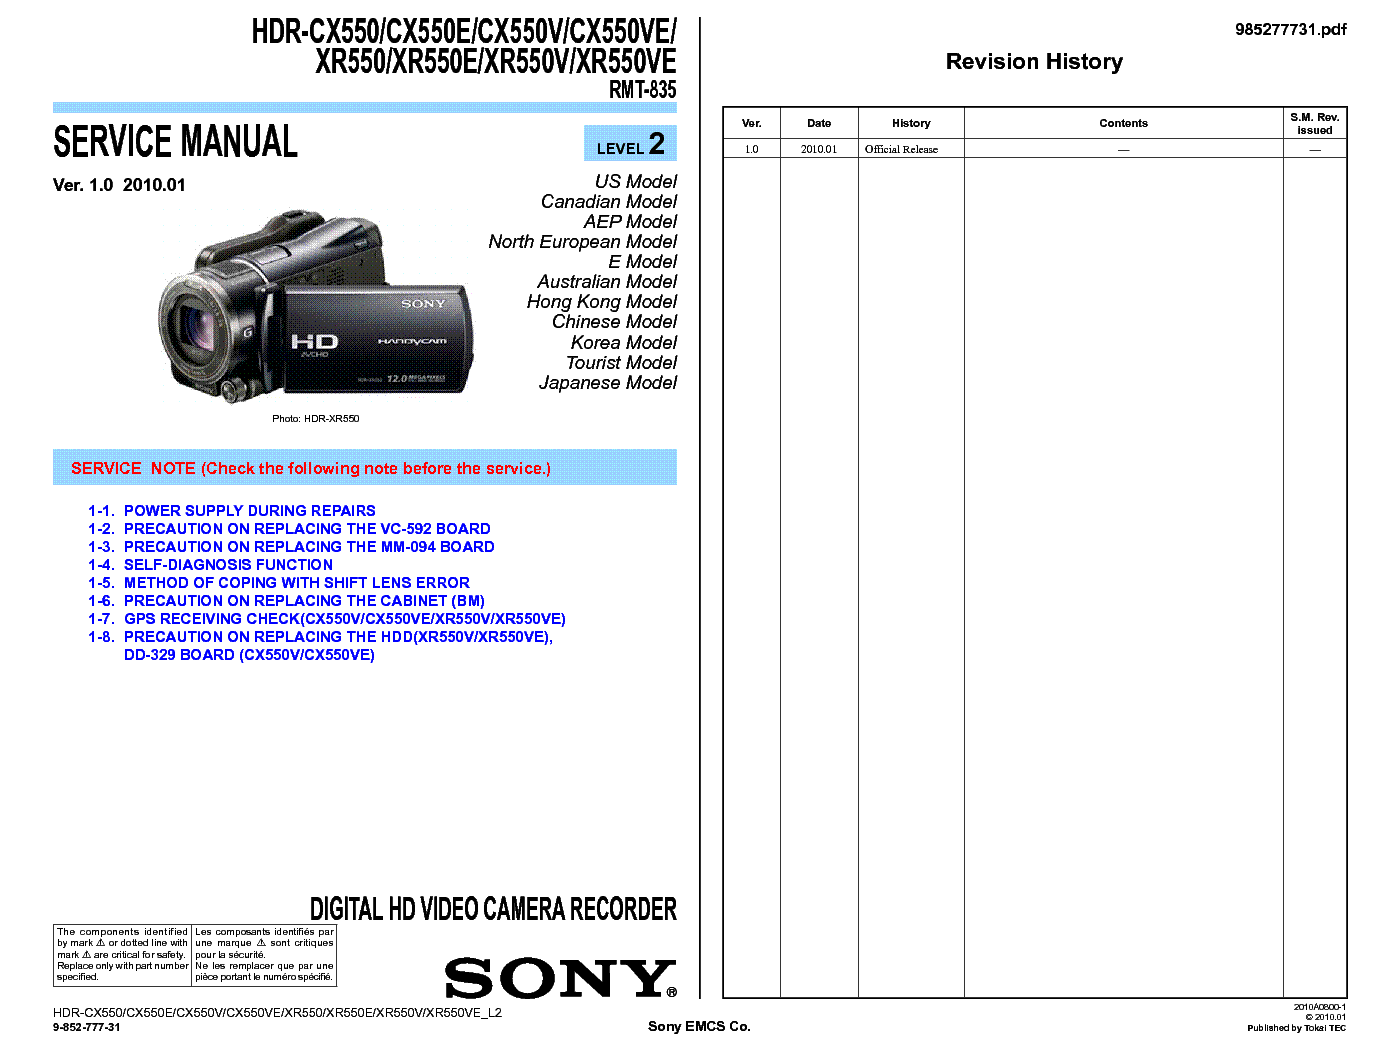 Sony hdr-cx550, hdr-cx550e, hdr-cx550v, hdr-cx550ve, hdr-xr550.